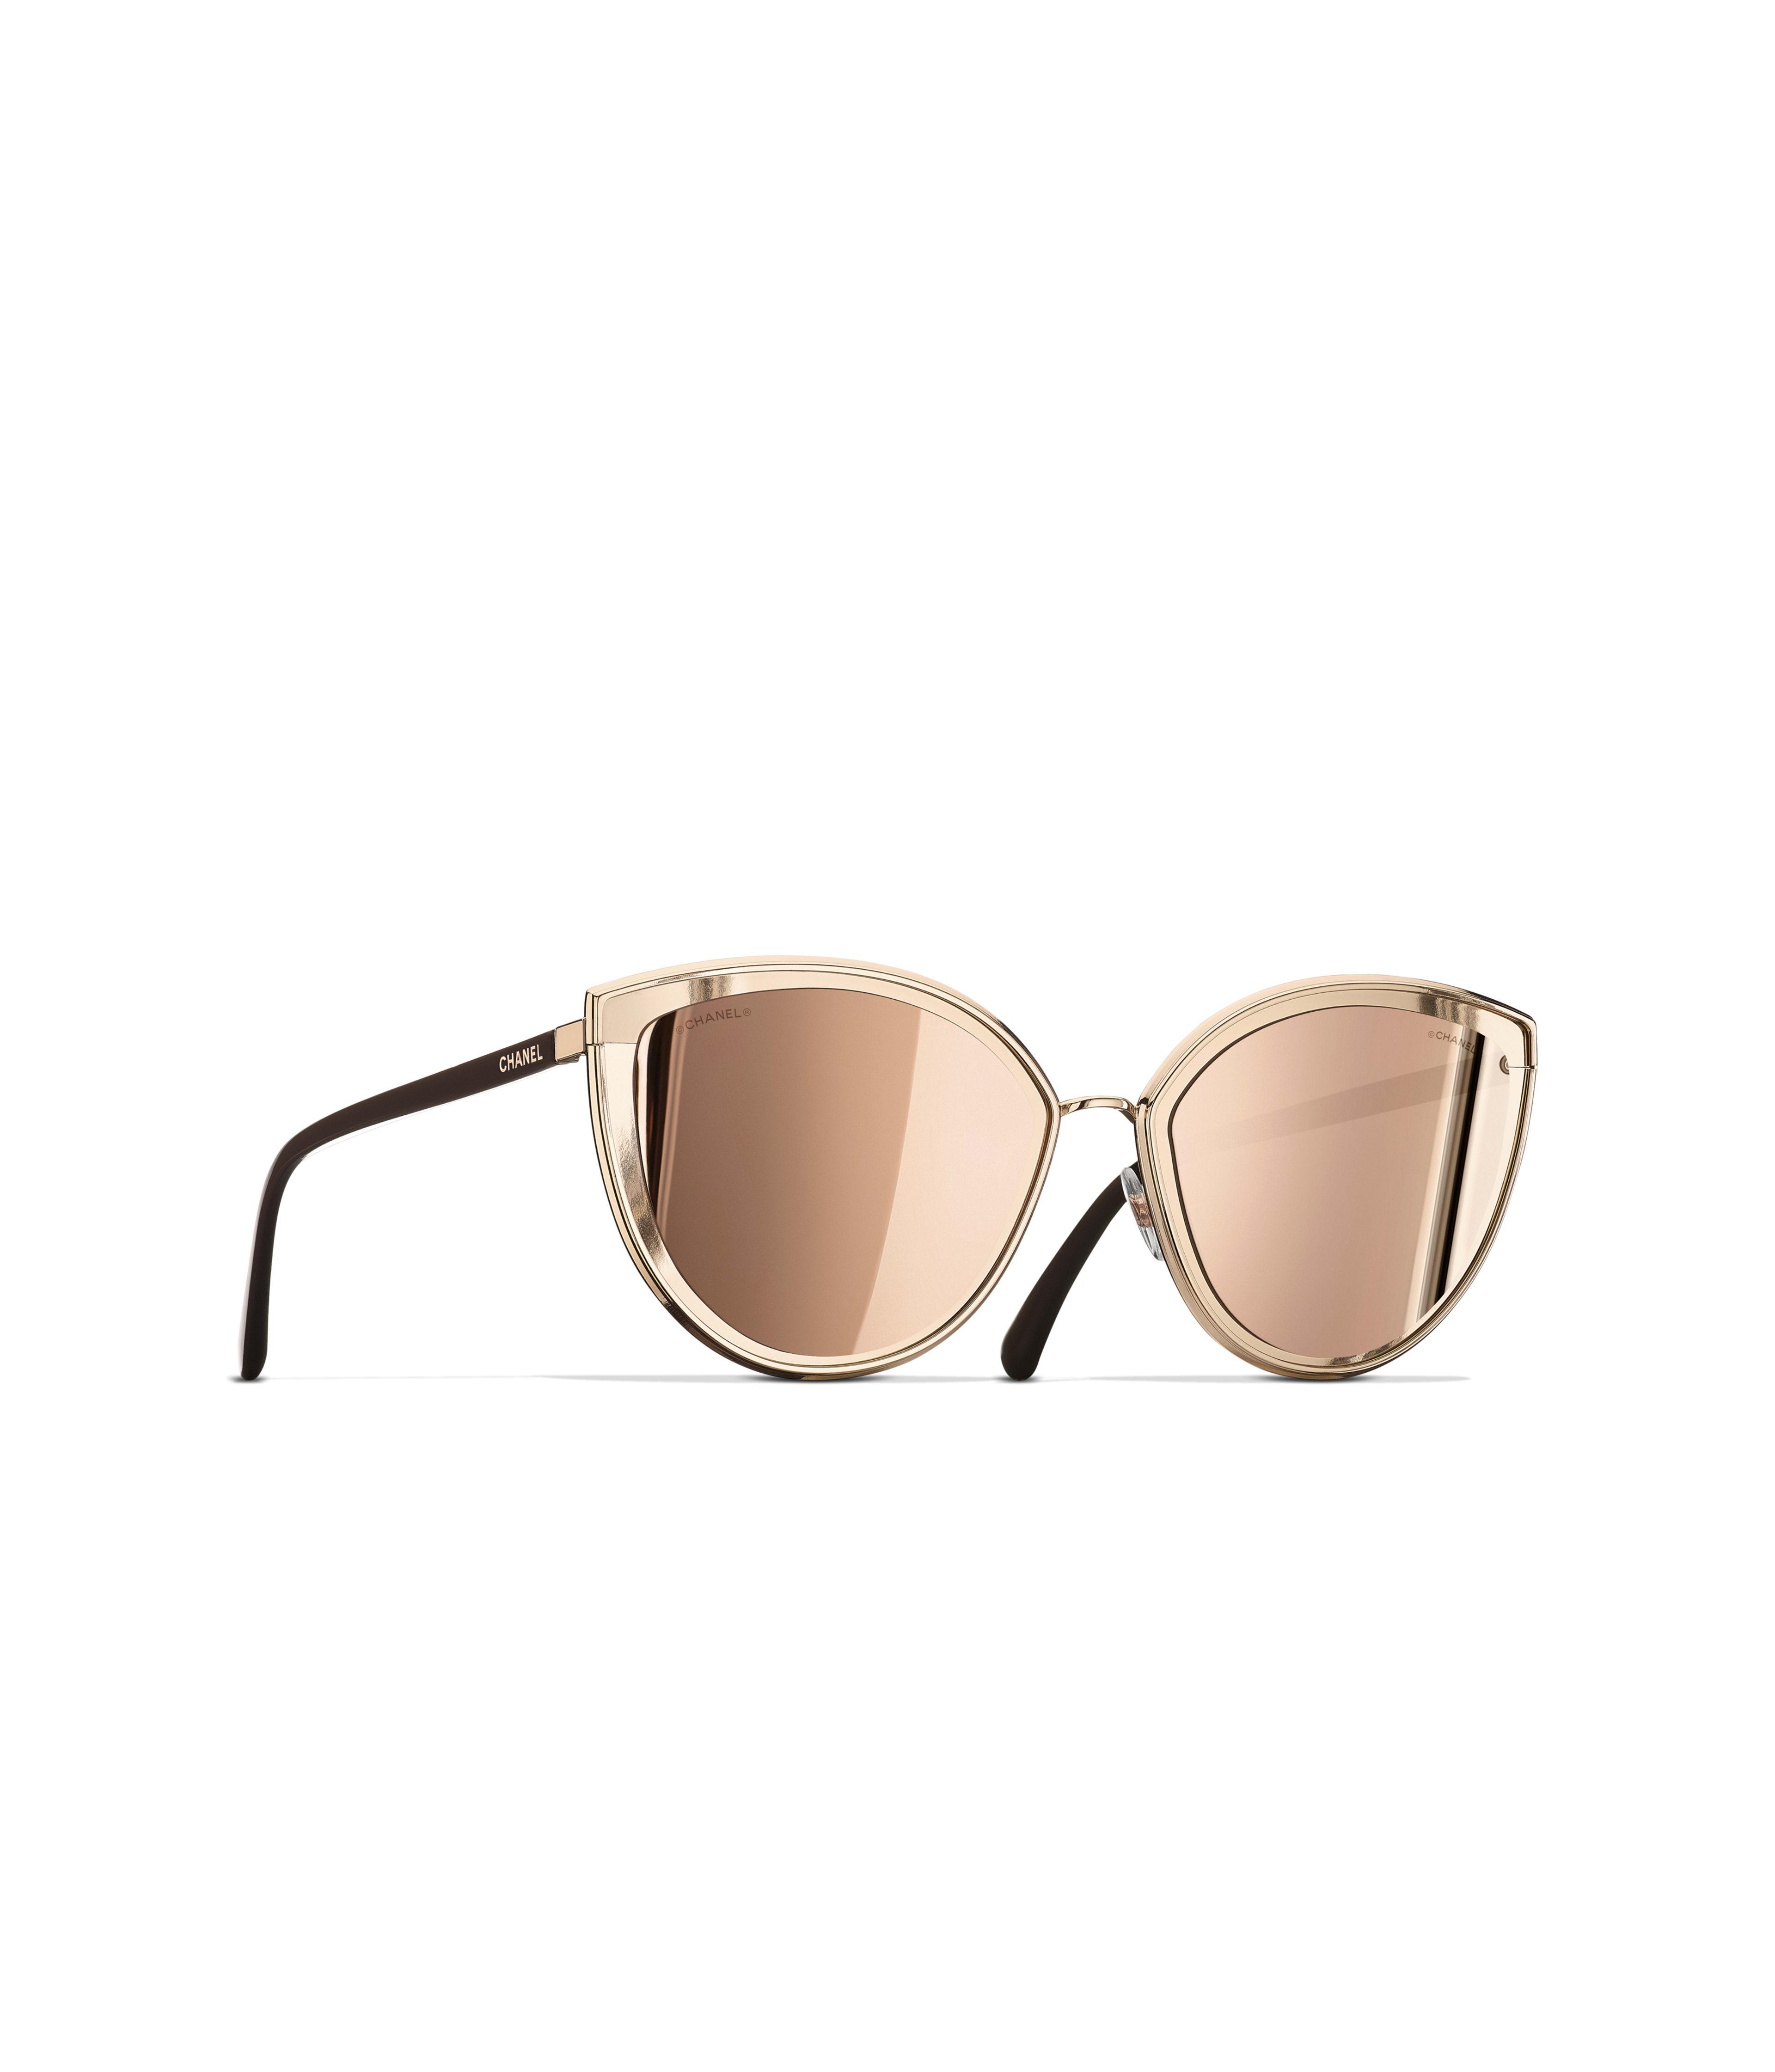 43f618341e1 Cat Eye Sunglasses Ref. 4222 C1174Z